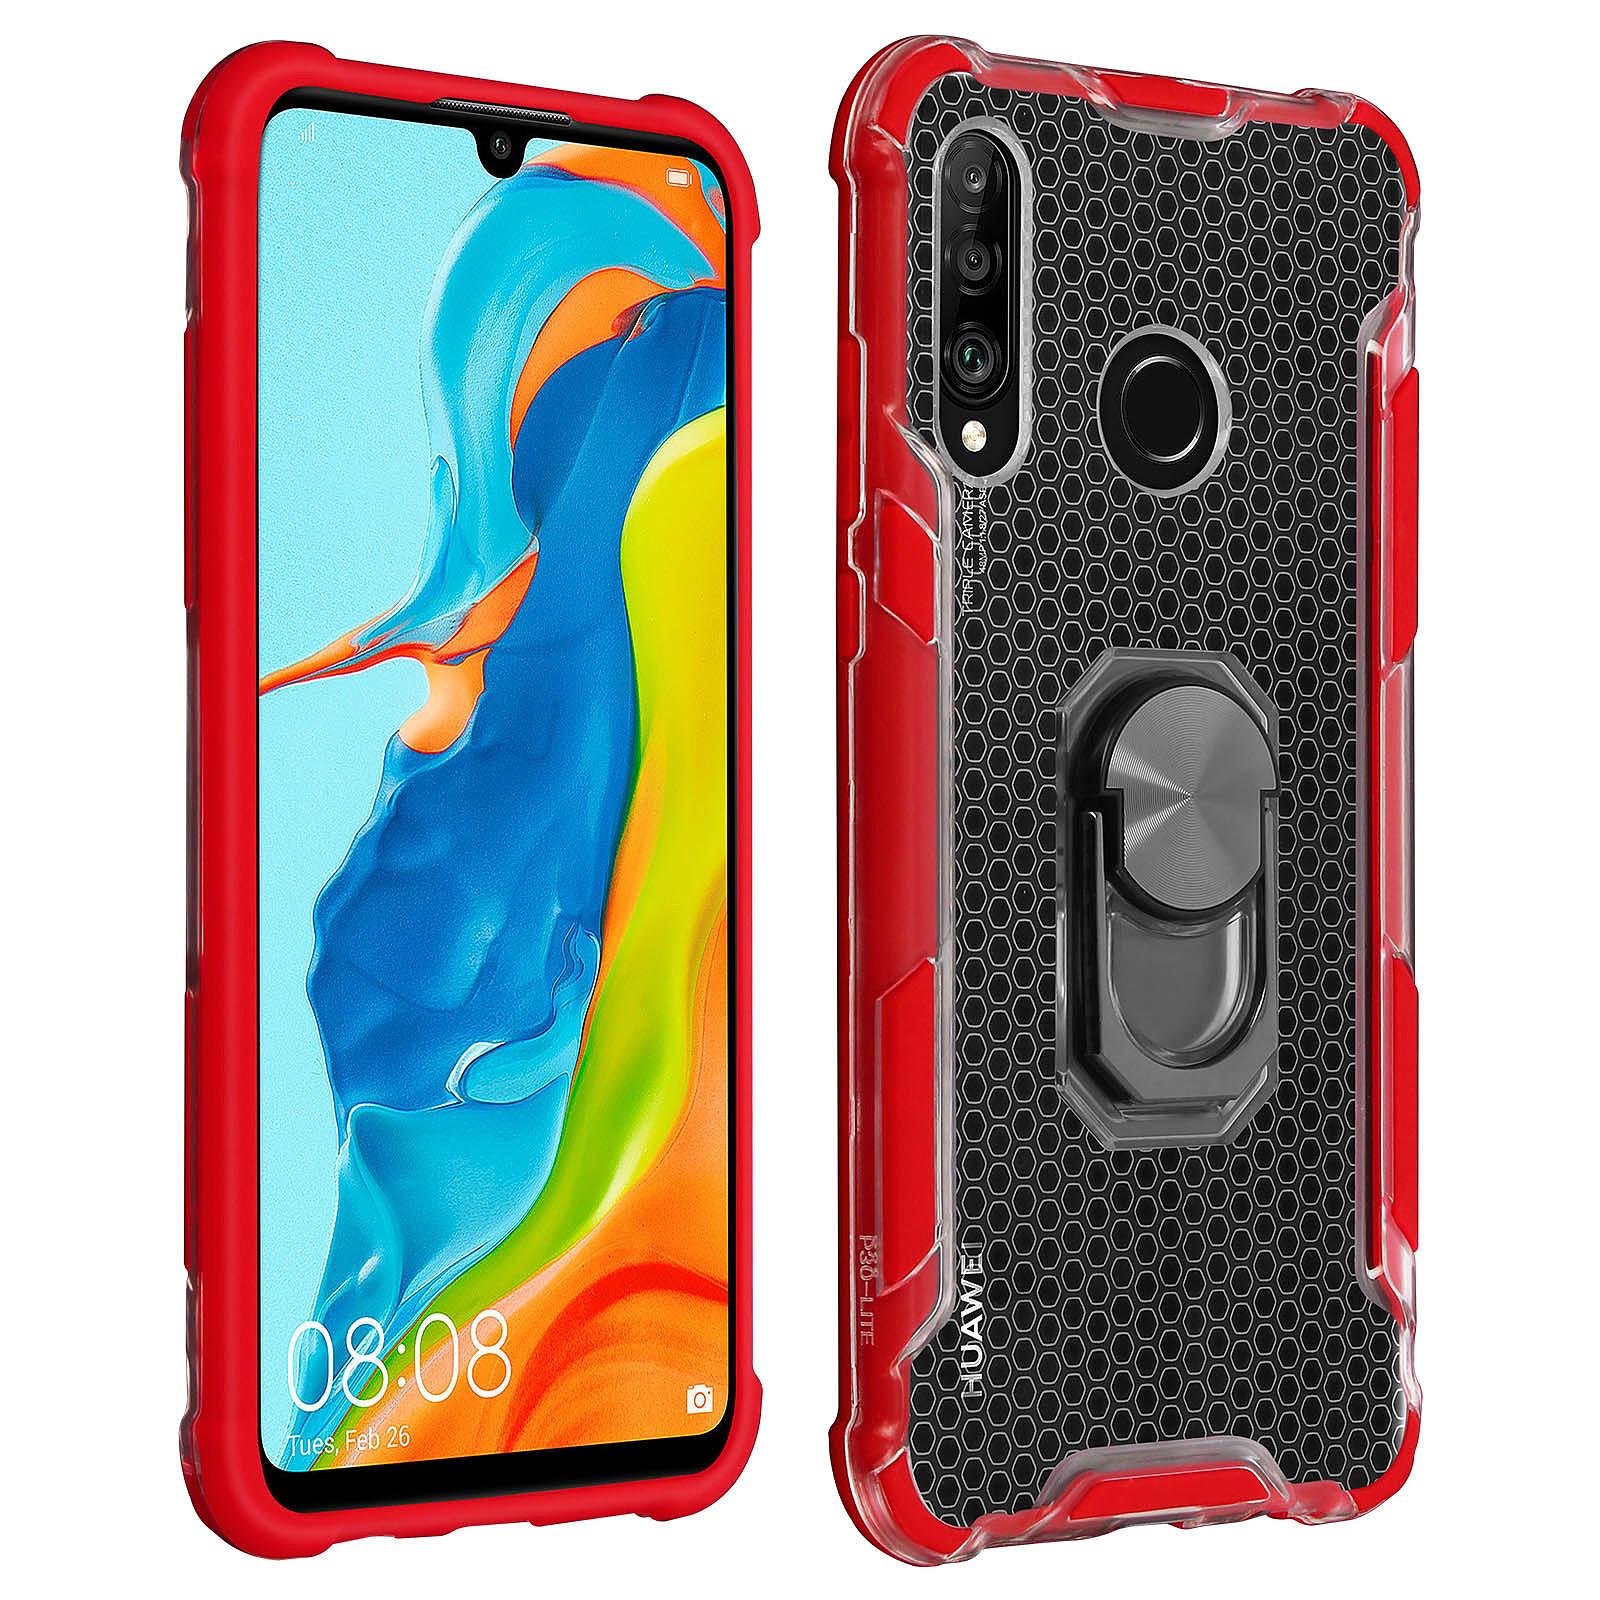 Avizar Coque Rouge pour Huawei P30 Lite , Honor 20S , Huawei P30 Lite XL